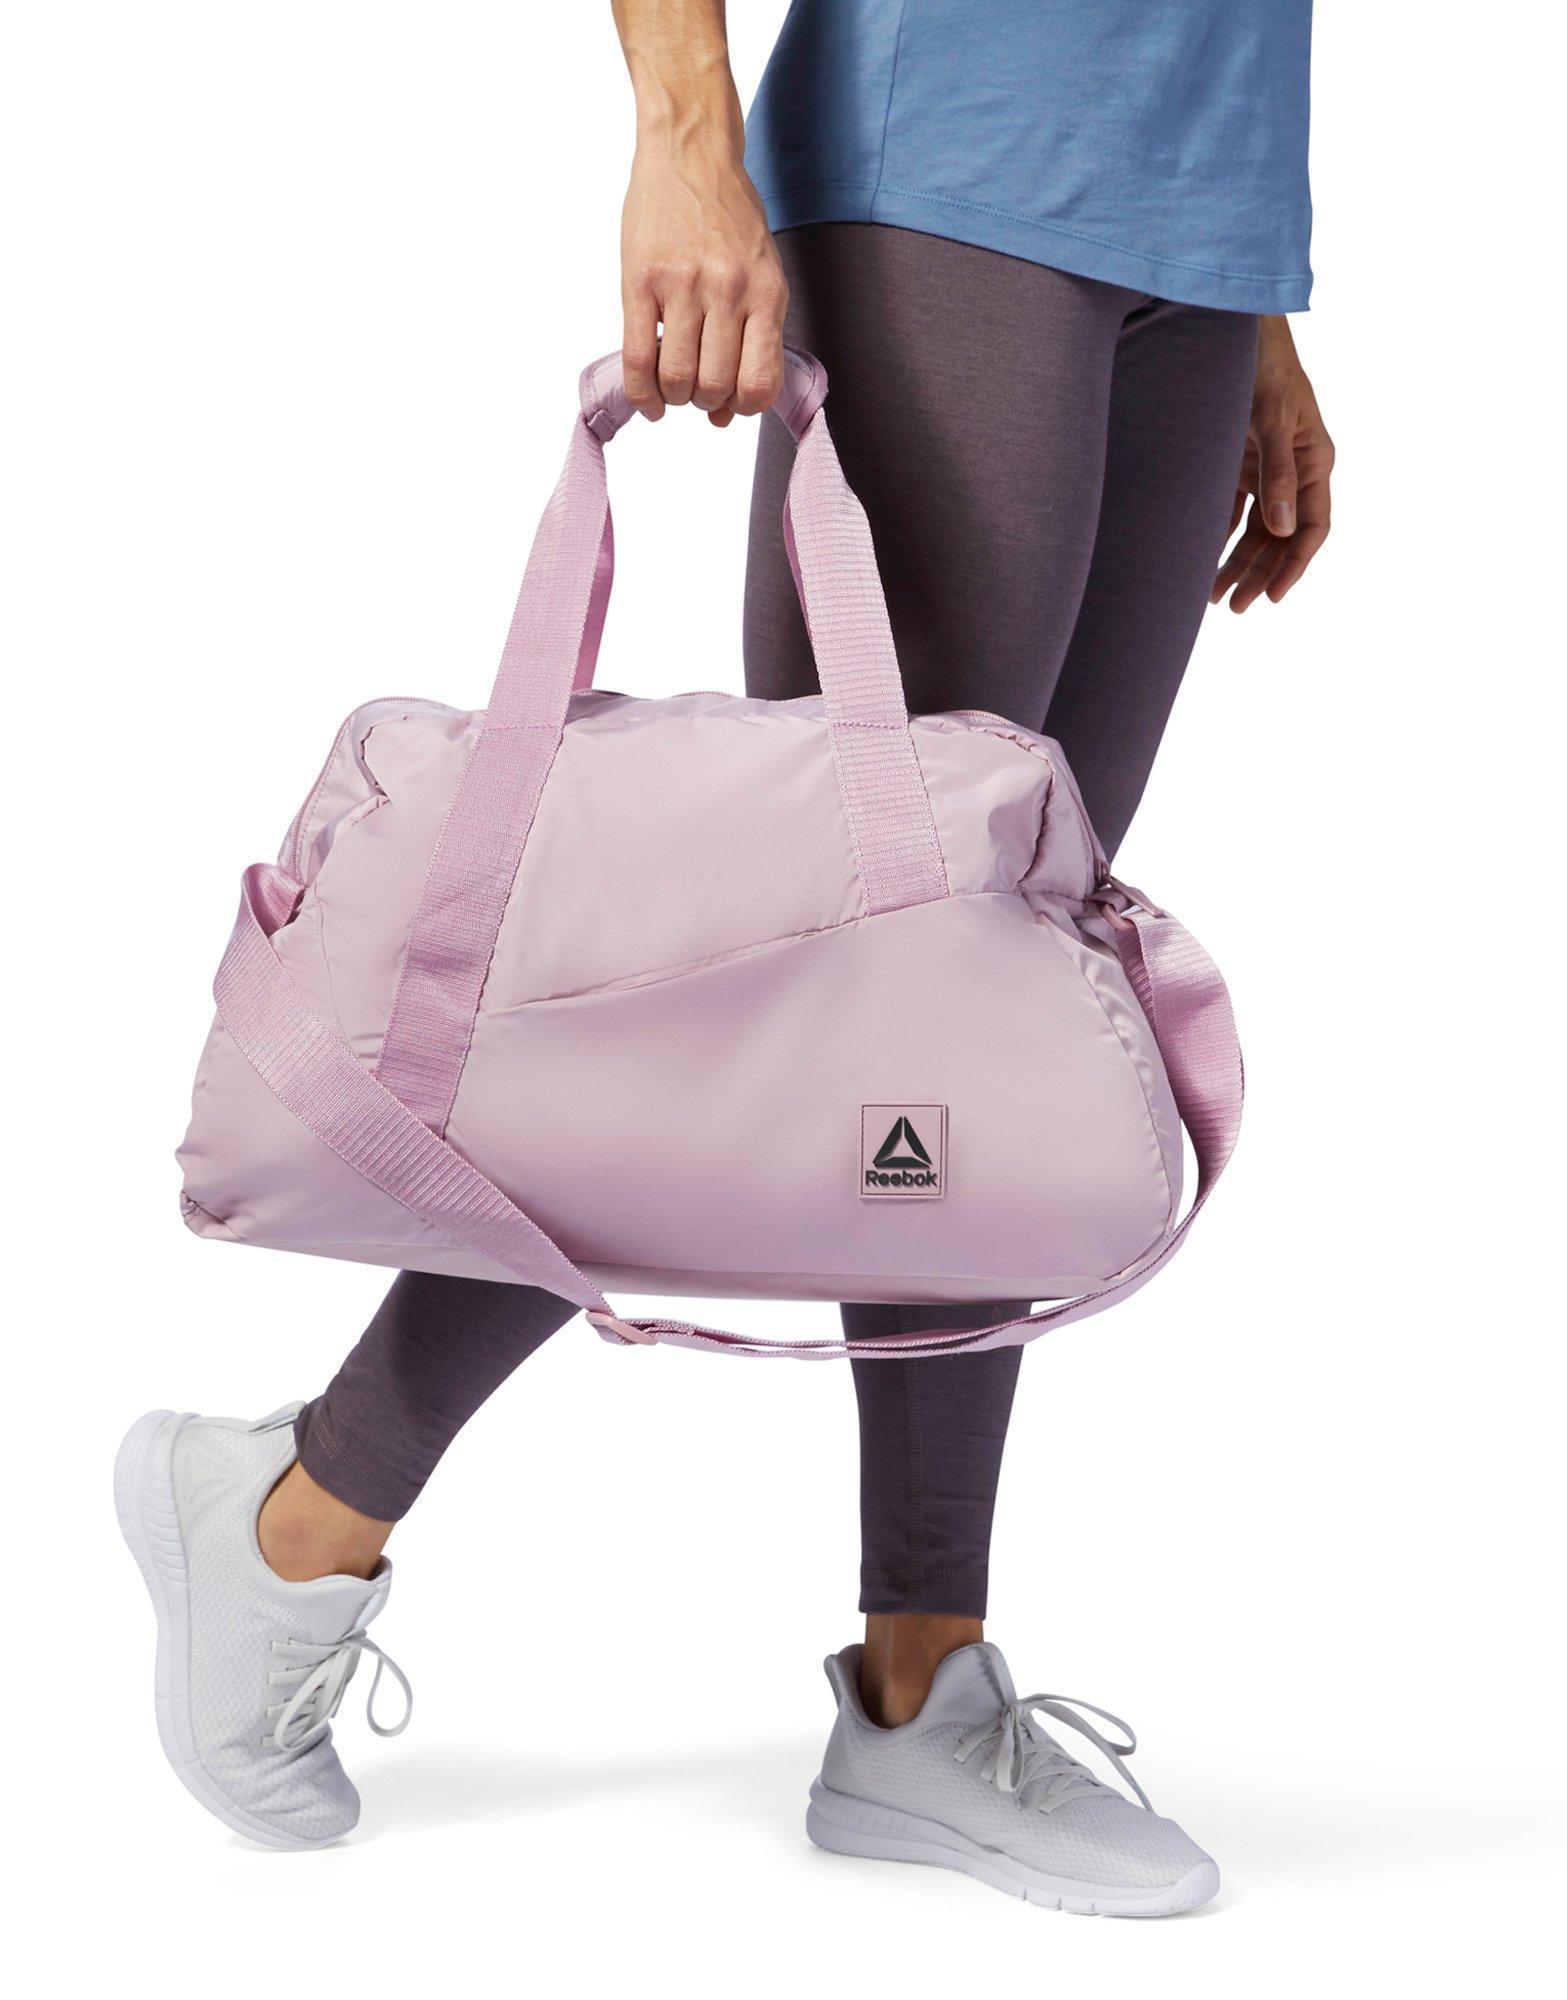 Lyst - Reebok Grip Duffle Bag 9e64c94460b24